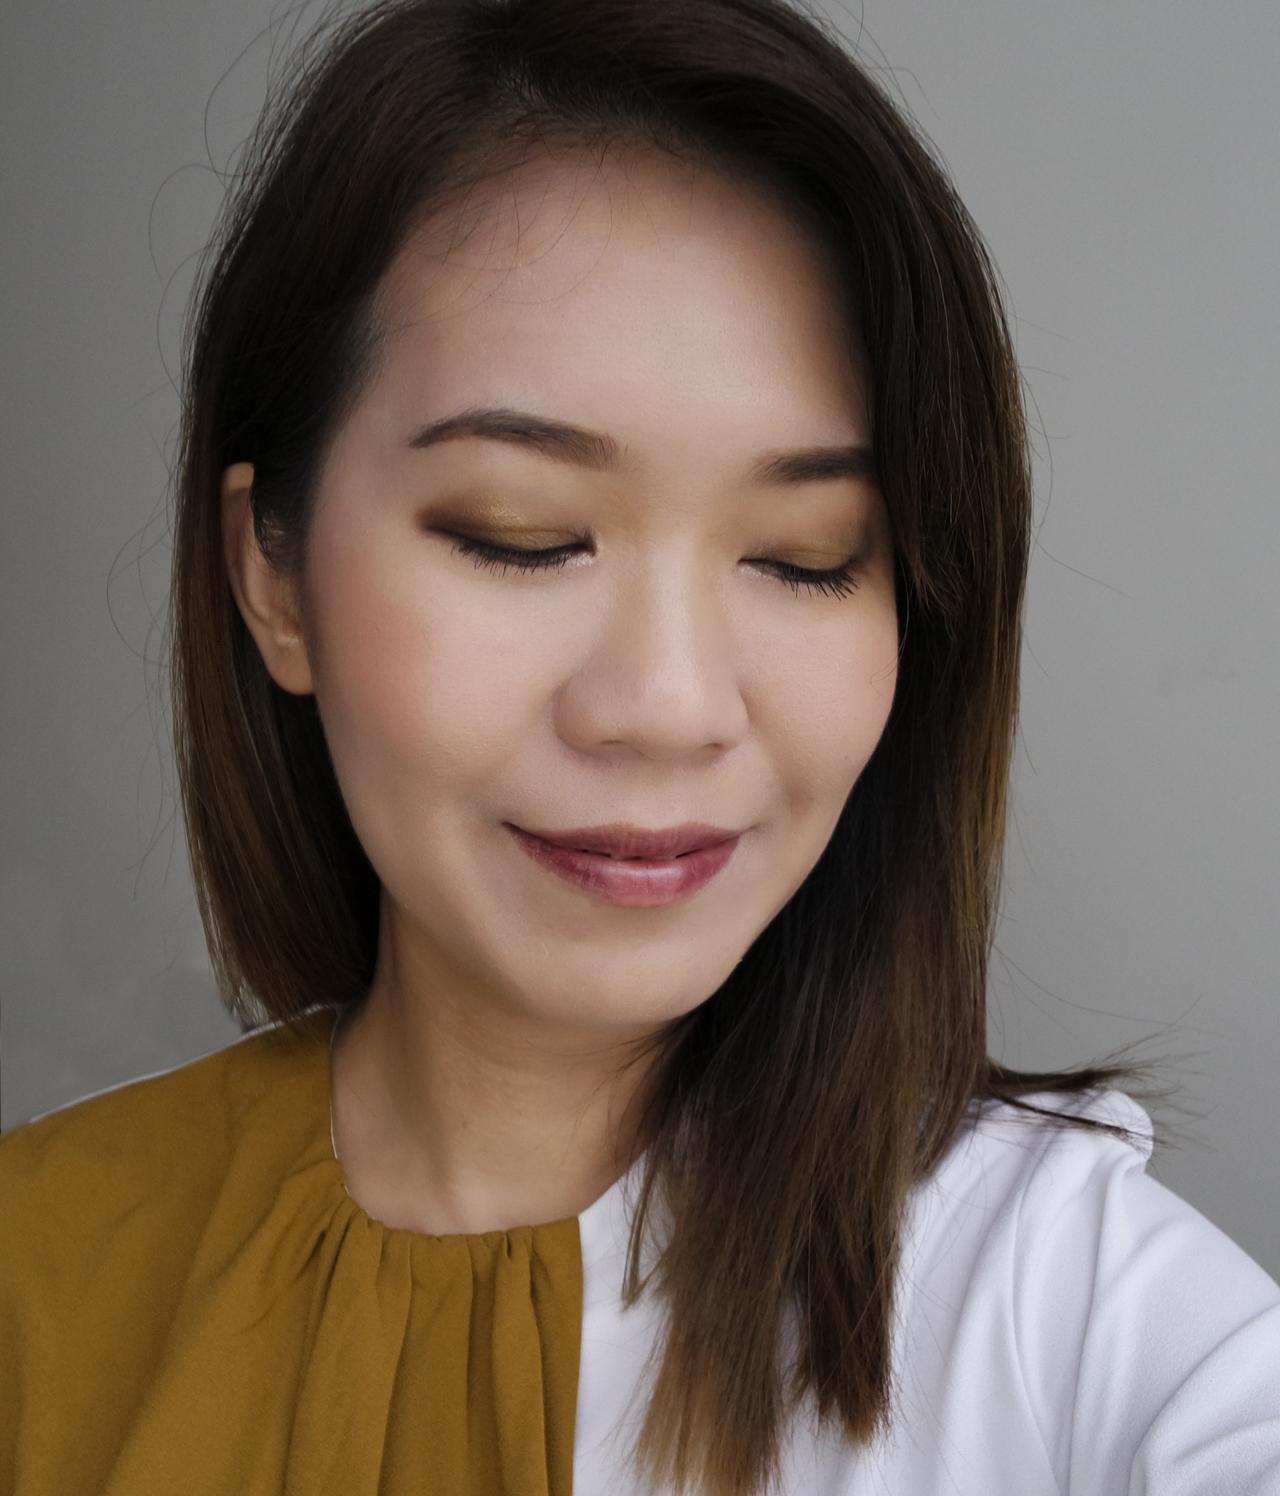 Chanel Coco Code makeup look